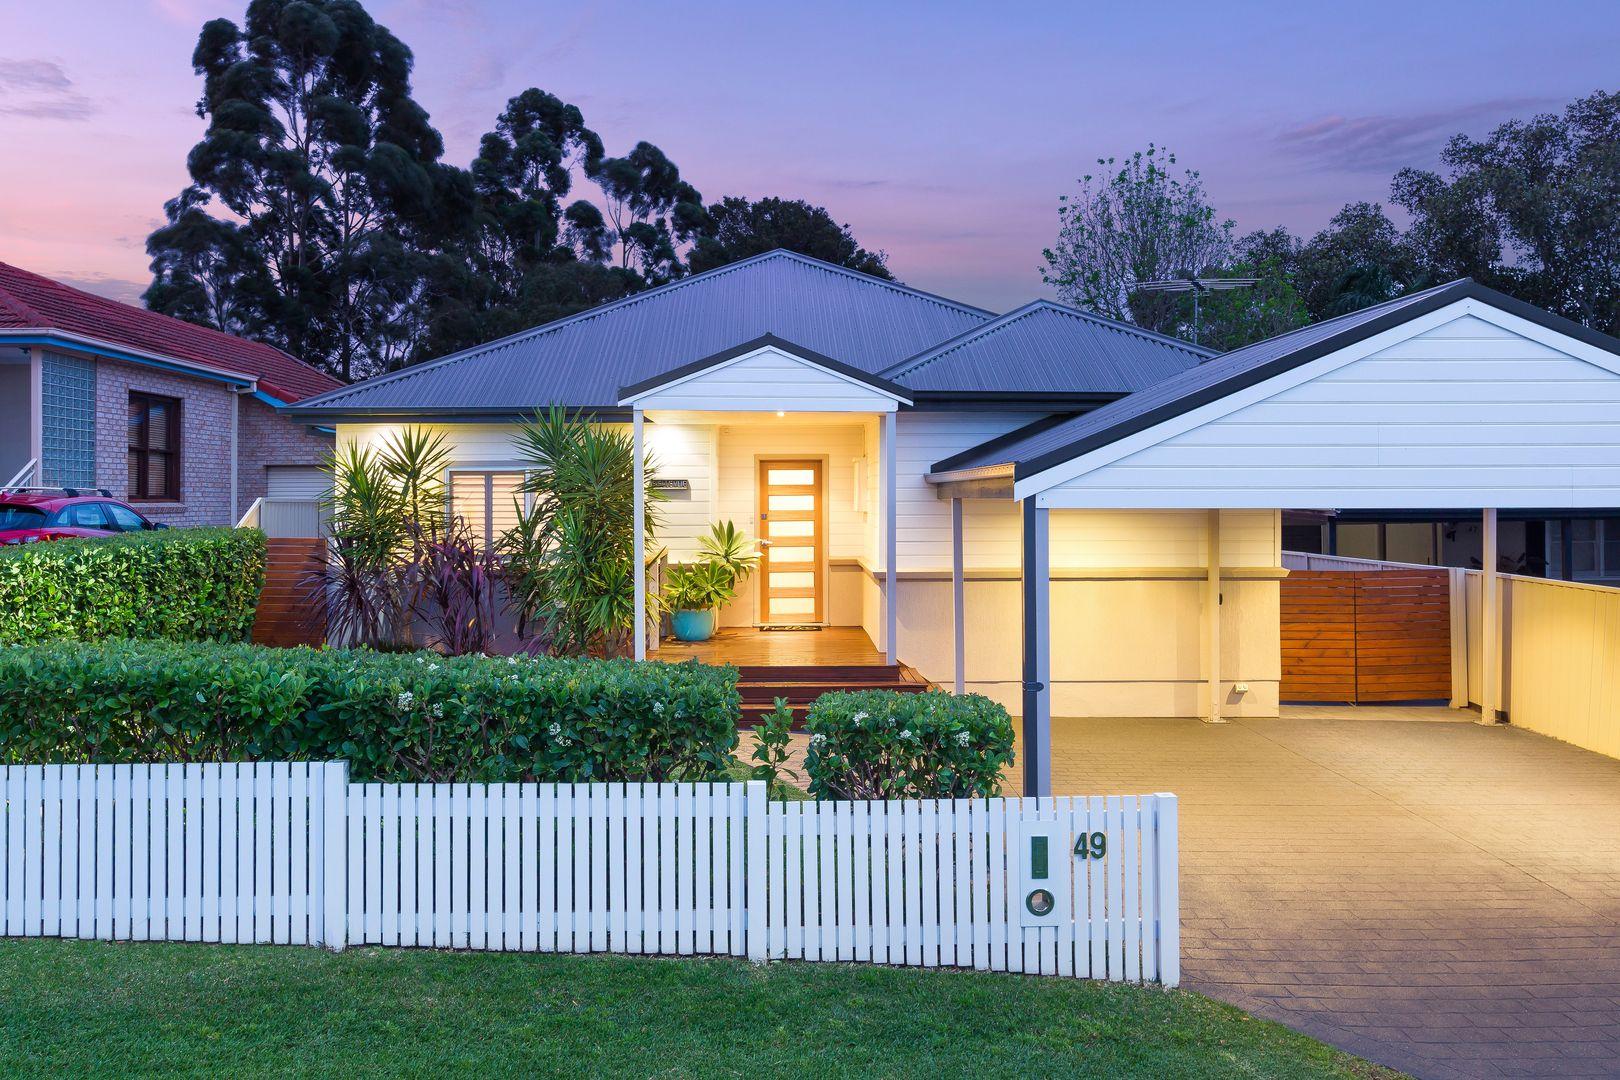 49 Scylla Road, Oyster Bay NSW 2225, Image 0